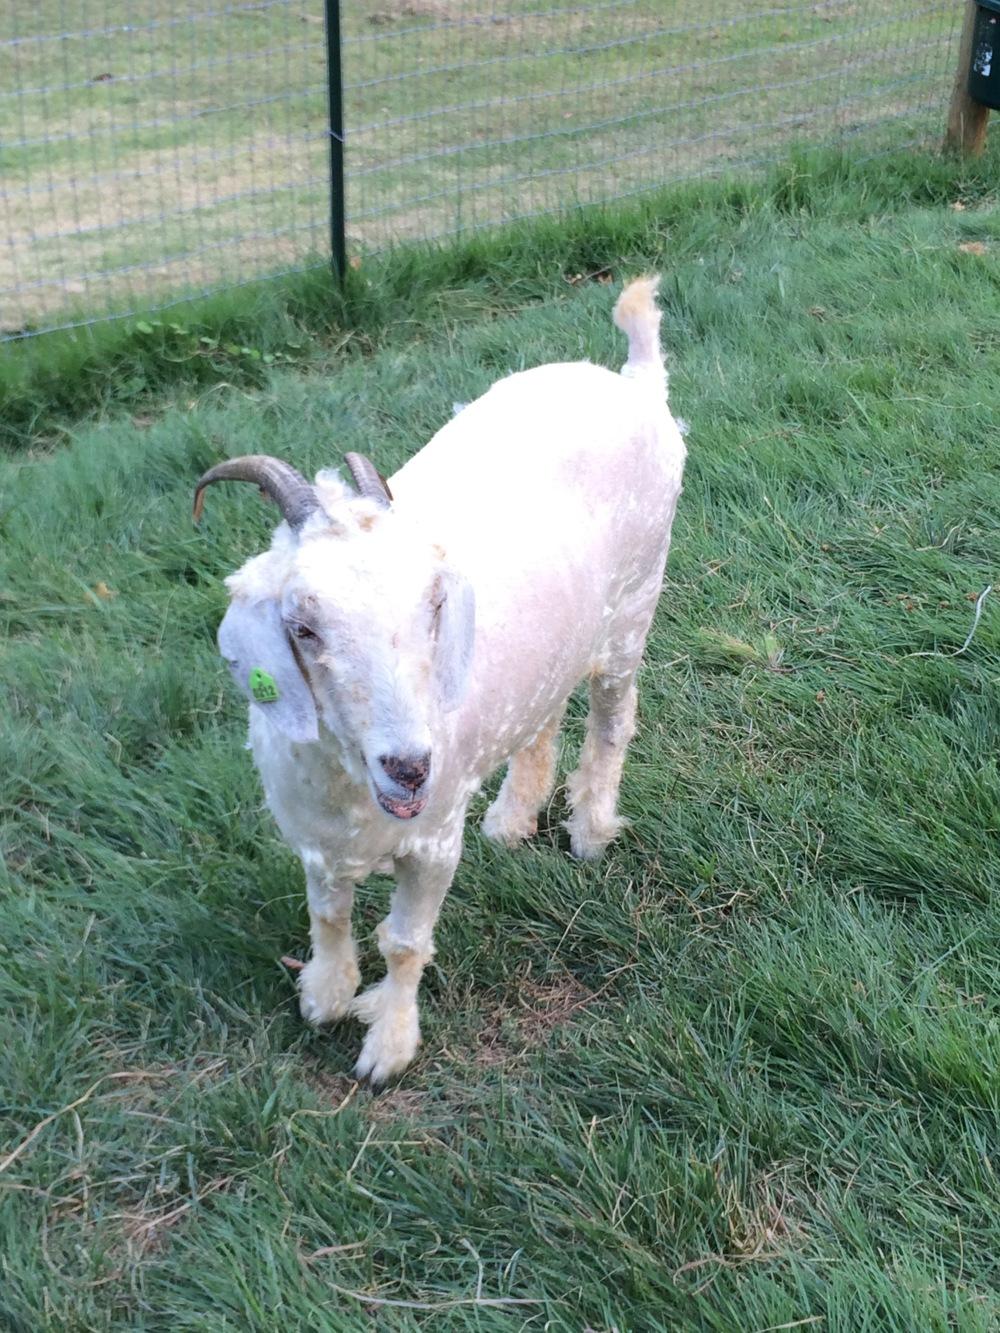 Amelia, on shearing day